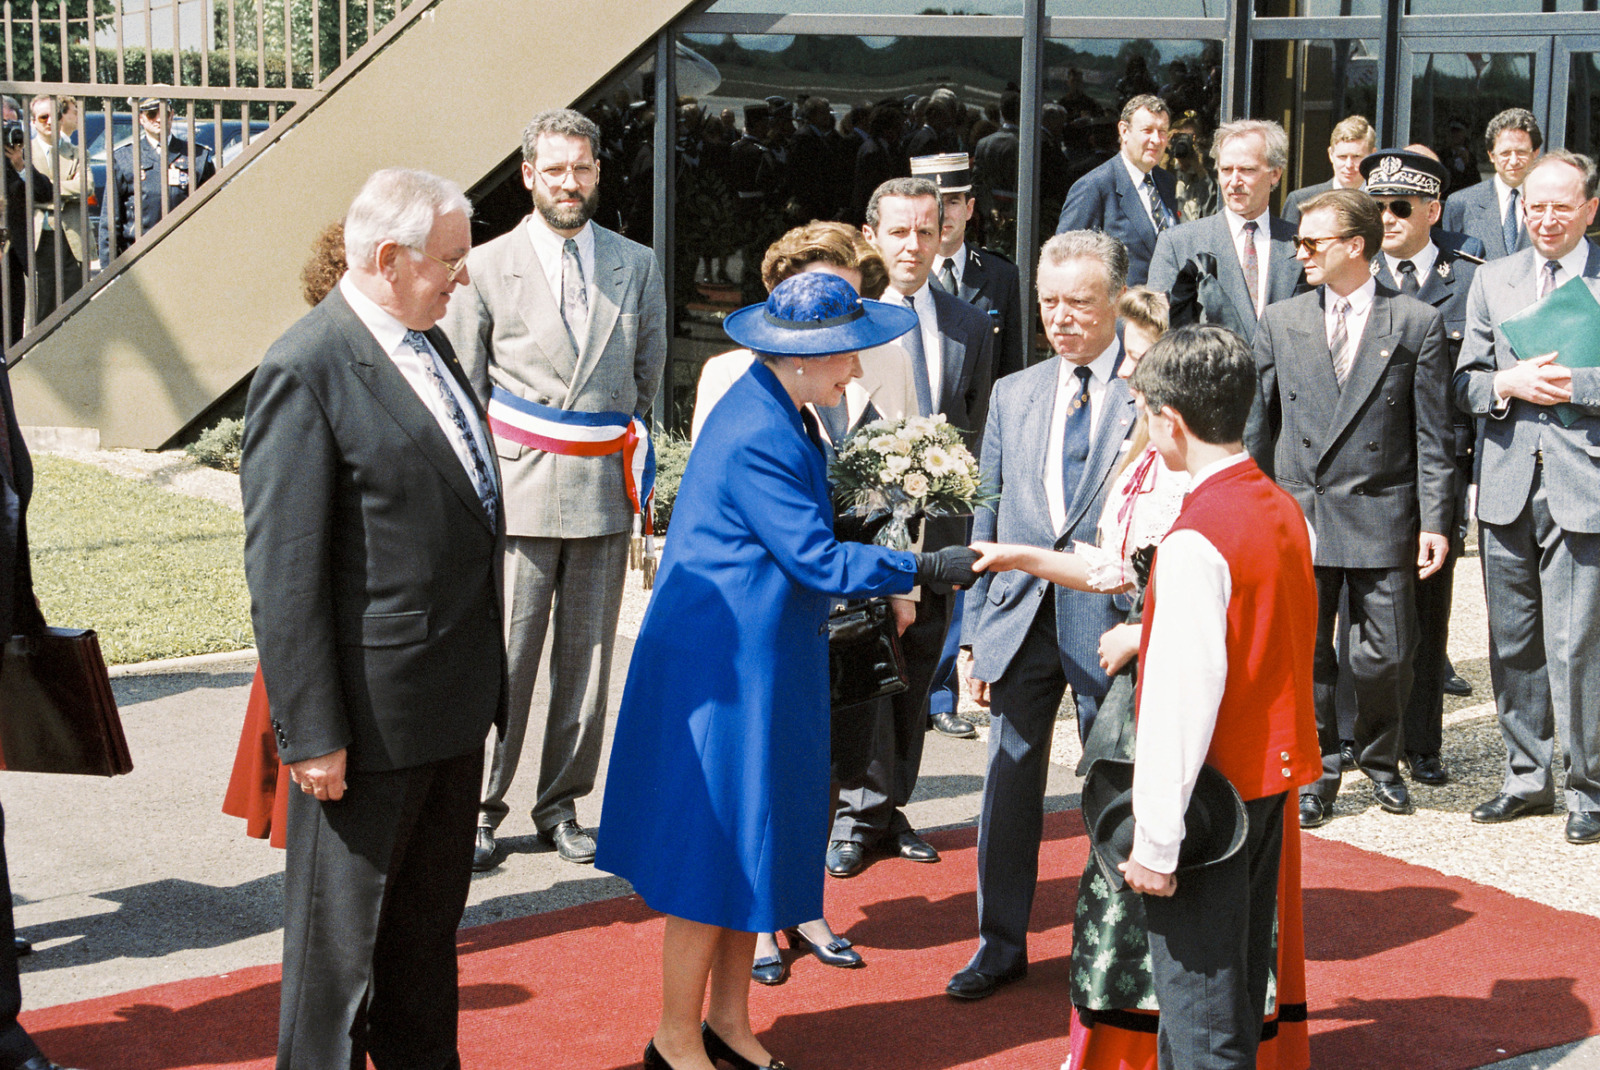 Queen Elizabeth II in France - official visit to the EP in Strasbourg © Egon Klepsch - Communautés Européennes 1992 - Source / PE